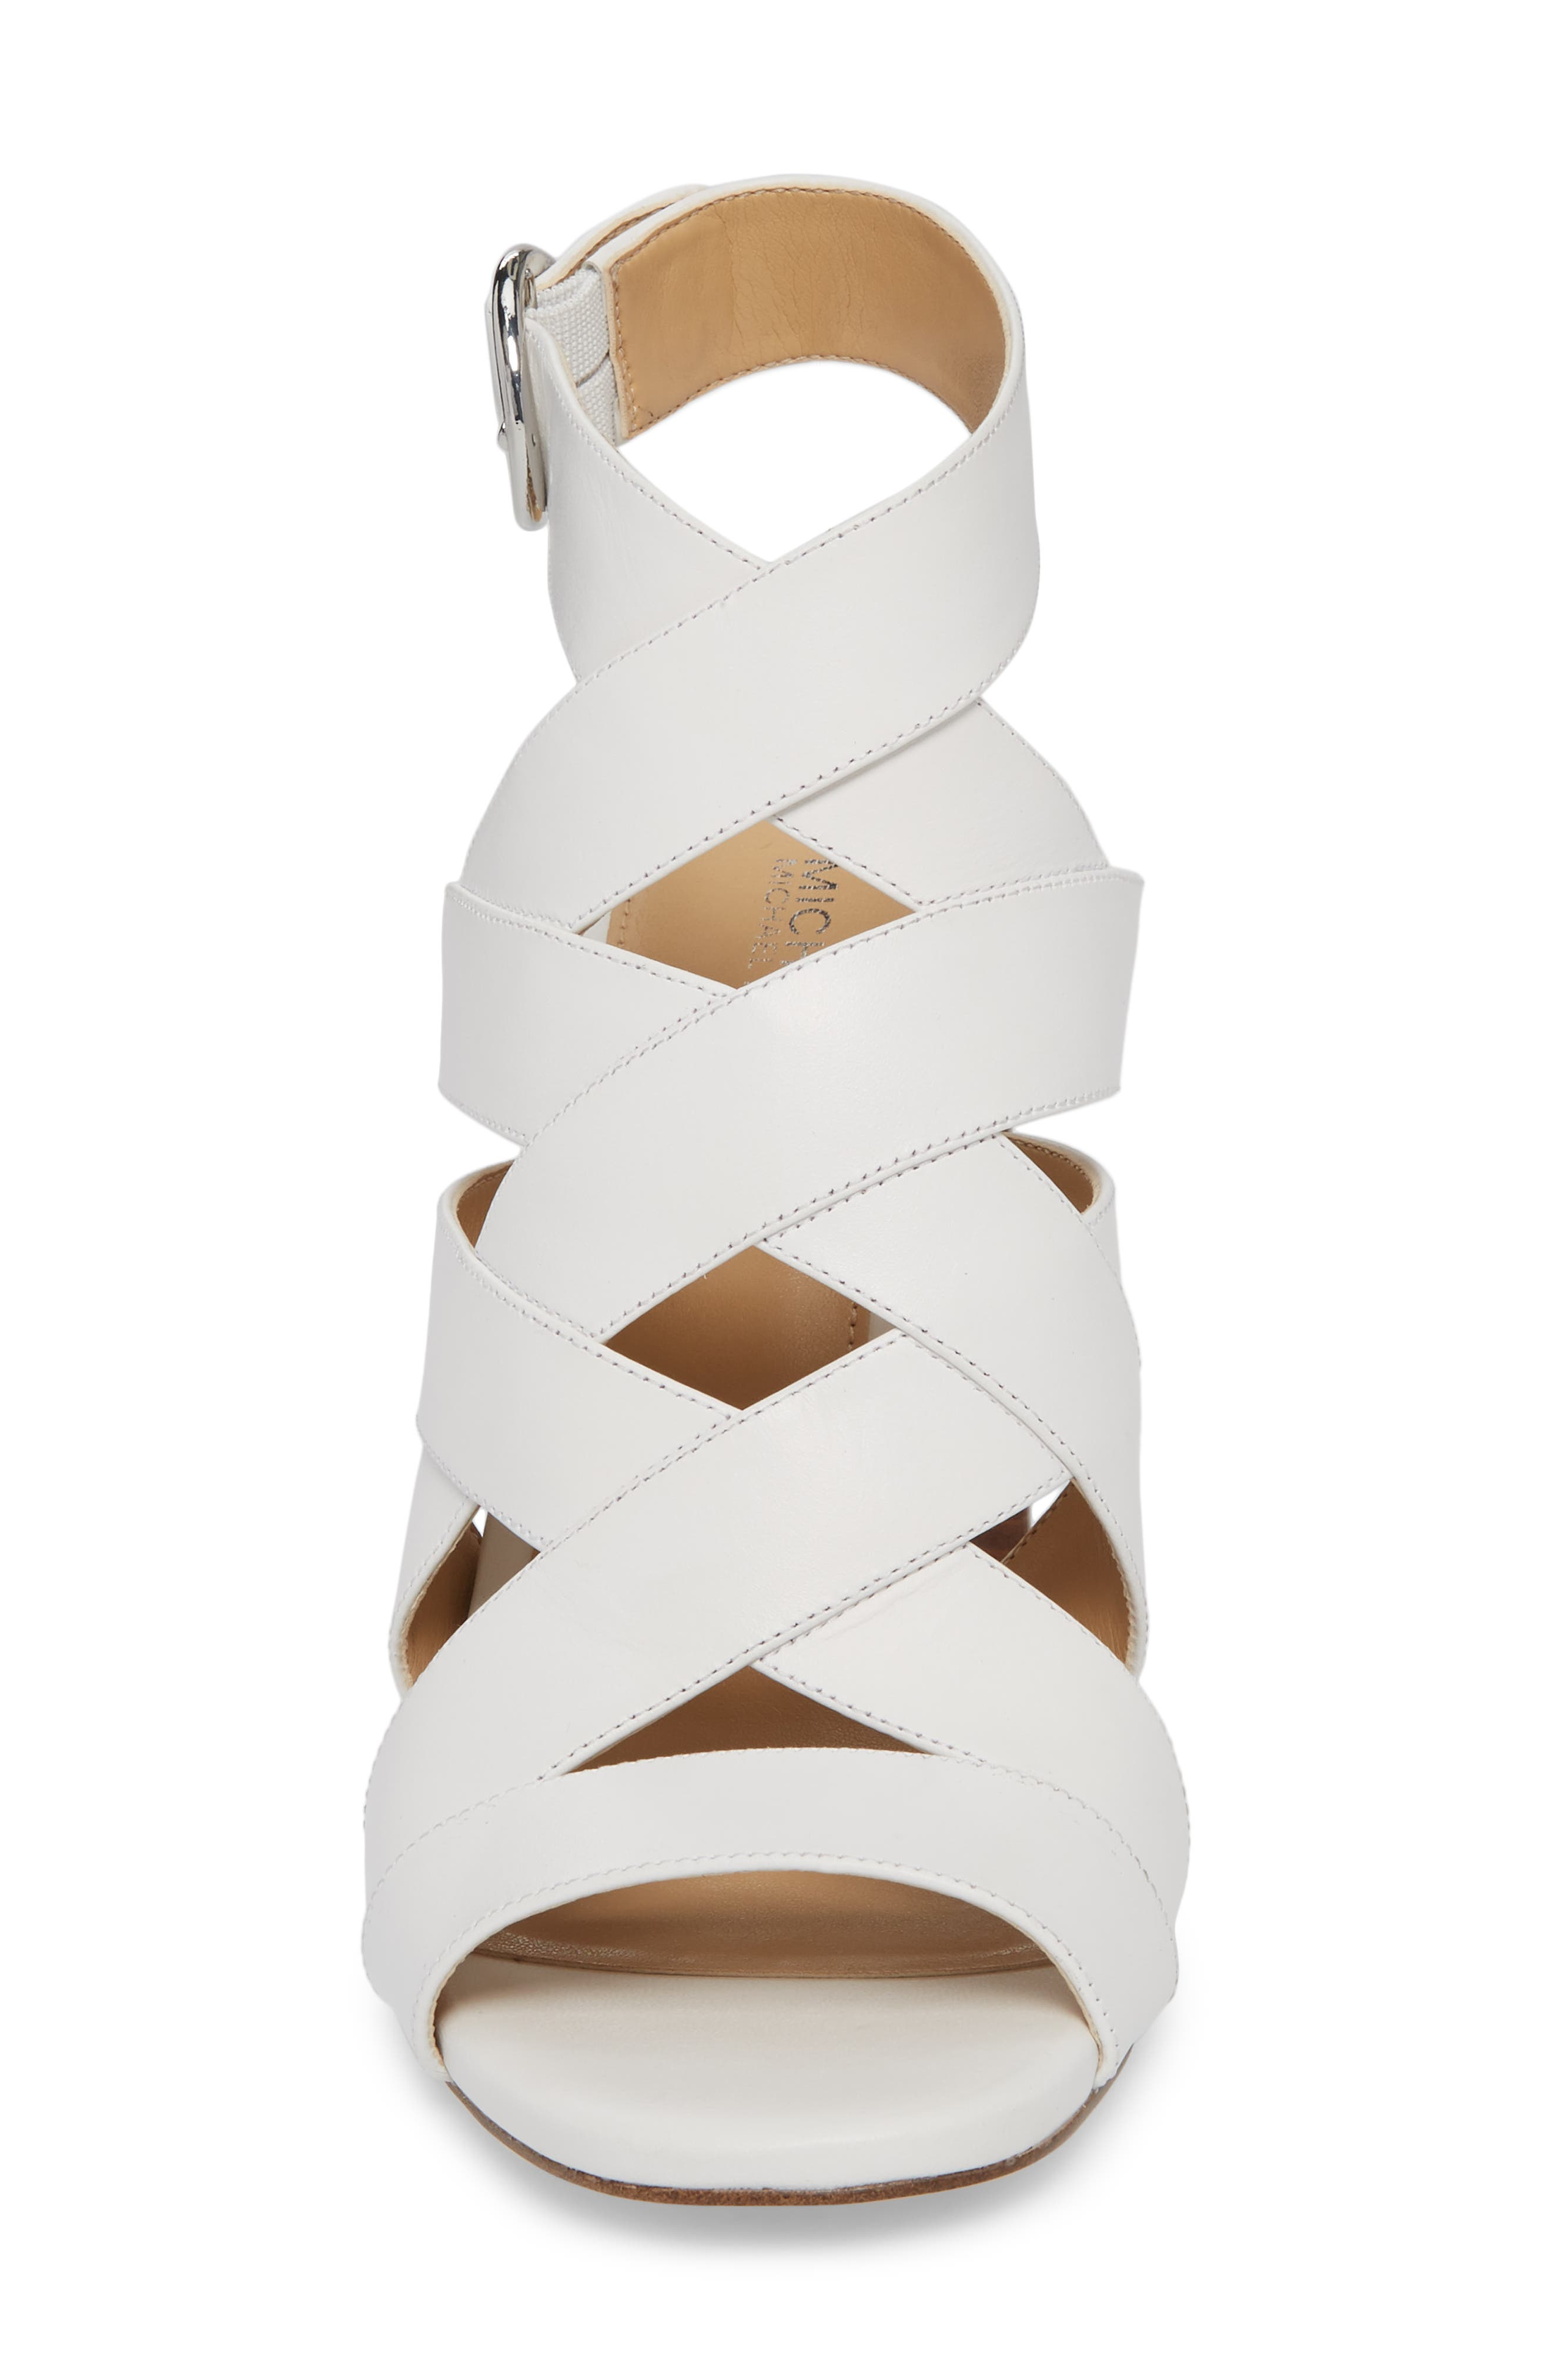 Alana Sandal,                             Alternate thumbnail 4, color,                             Optic White Leather